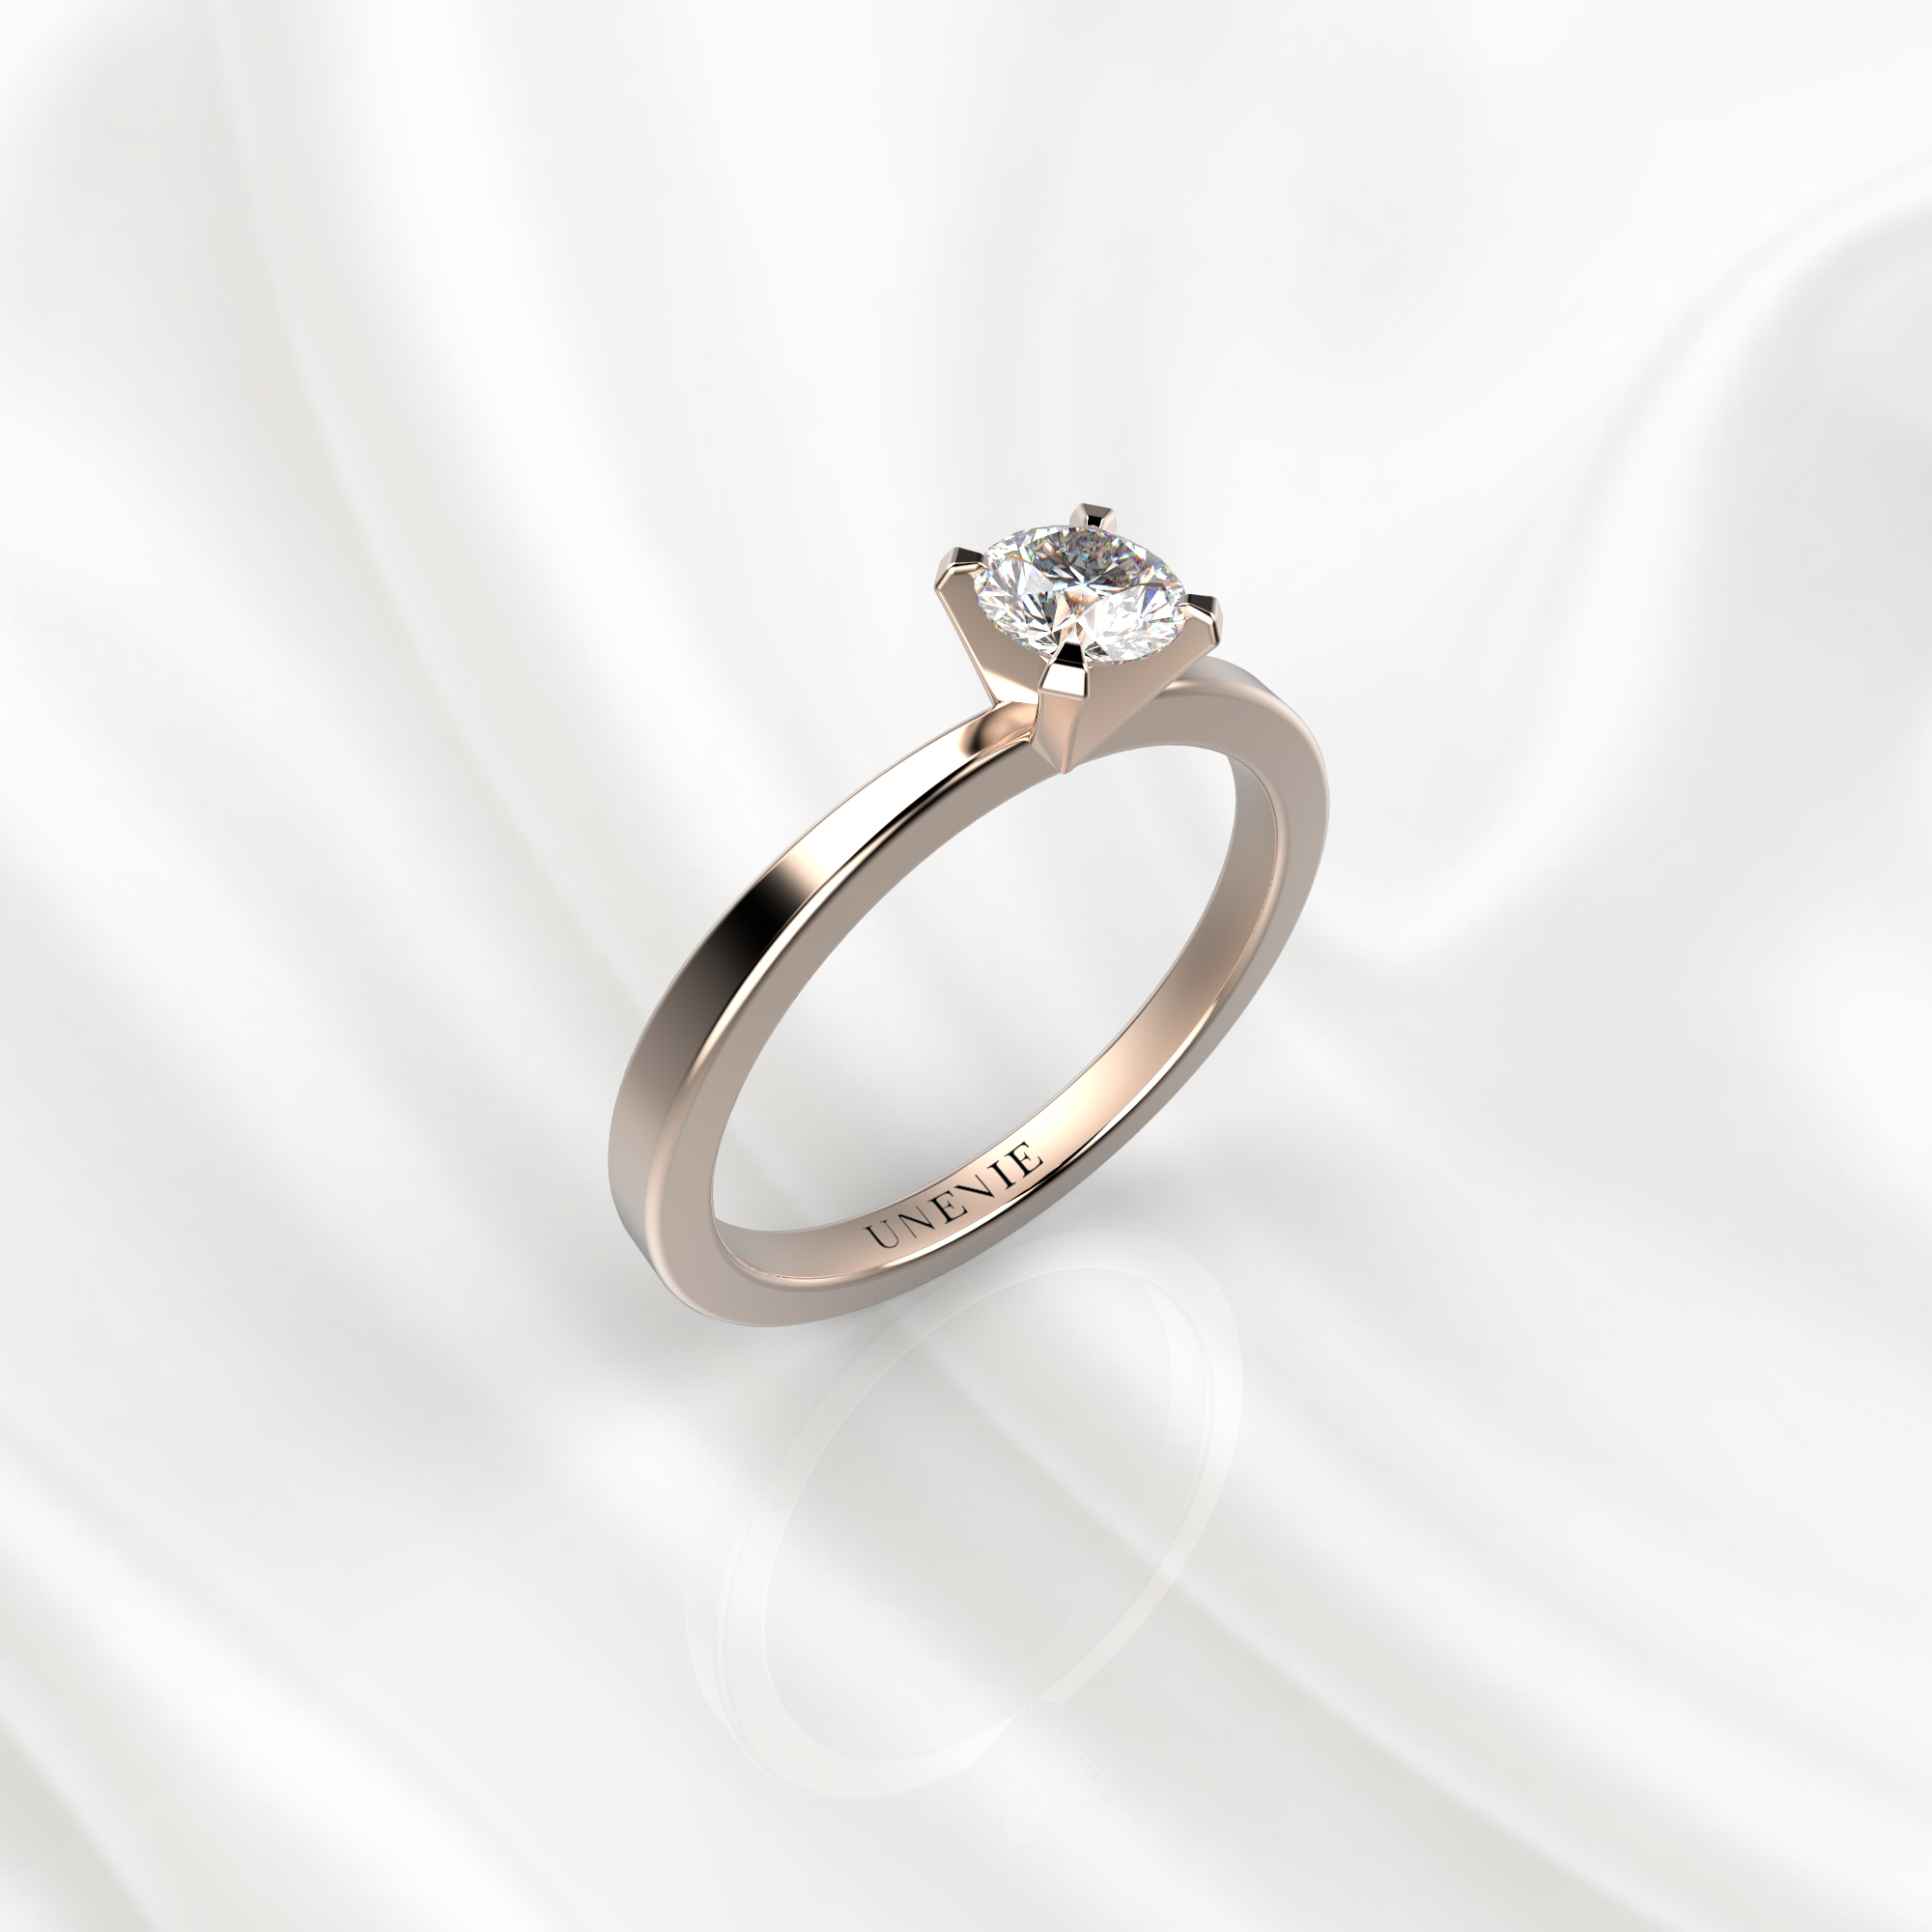 N24 Помолвочное кольцо из розового золота с бриллиантом 0.28 карат